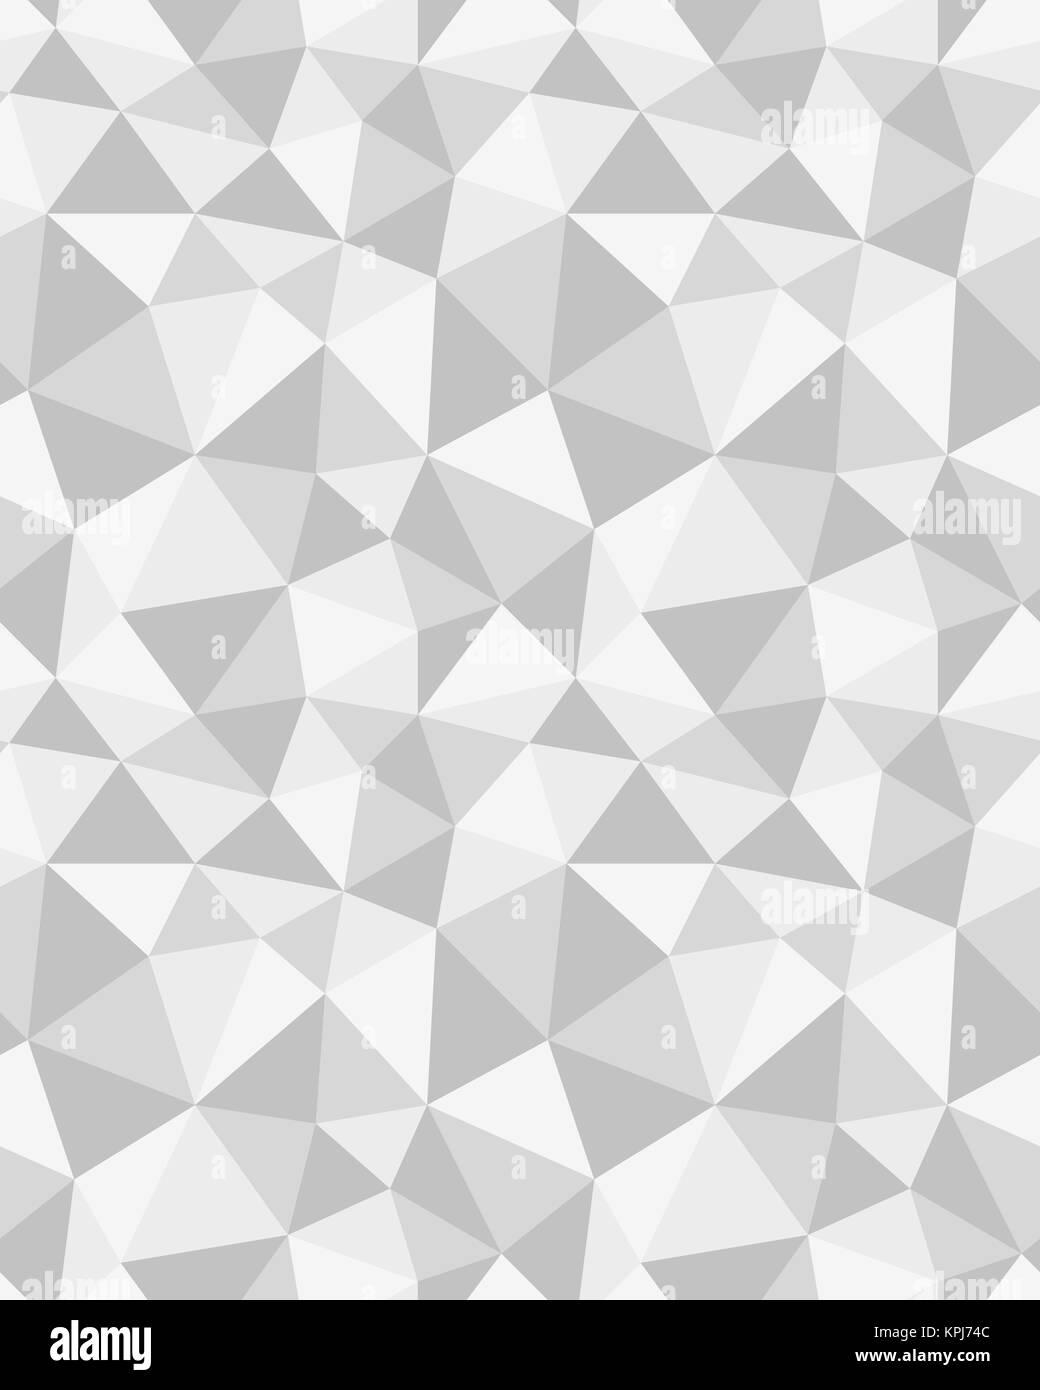 Fein Mosaik Farbseiten Ideen - Malvorlagen Von Tieren - ngadi.info